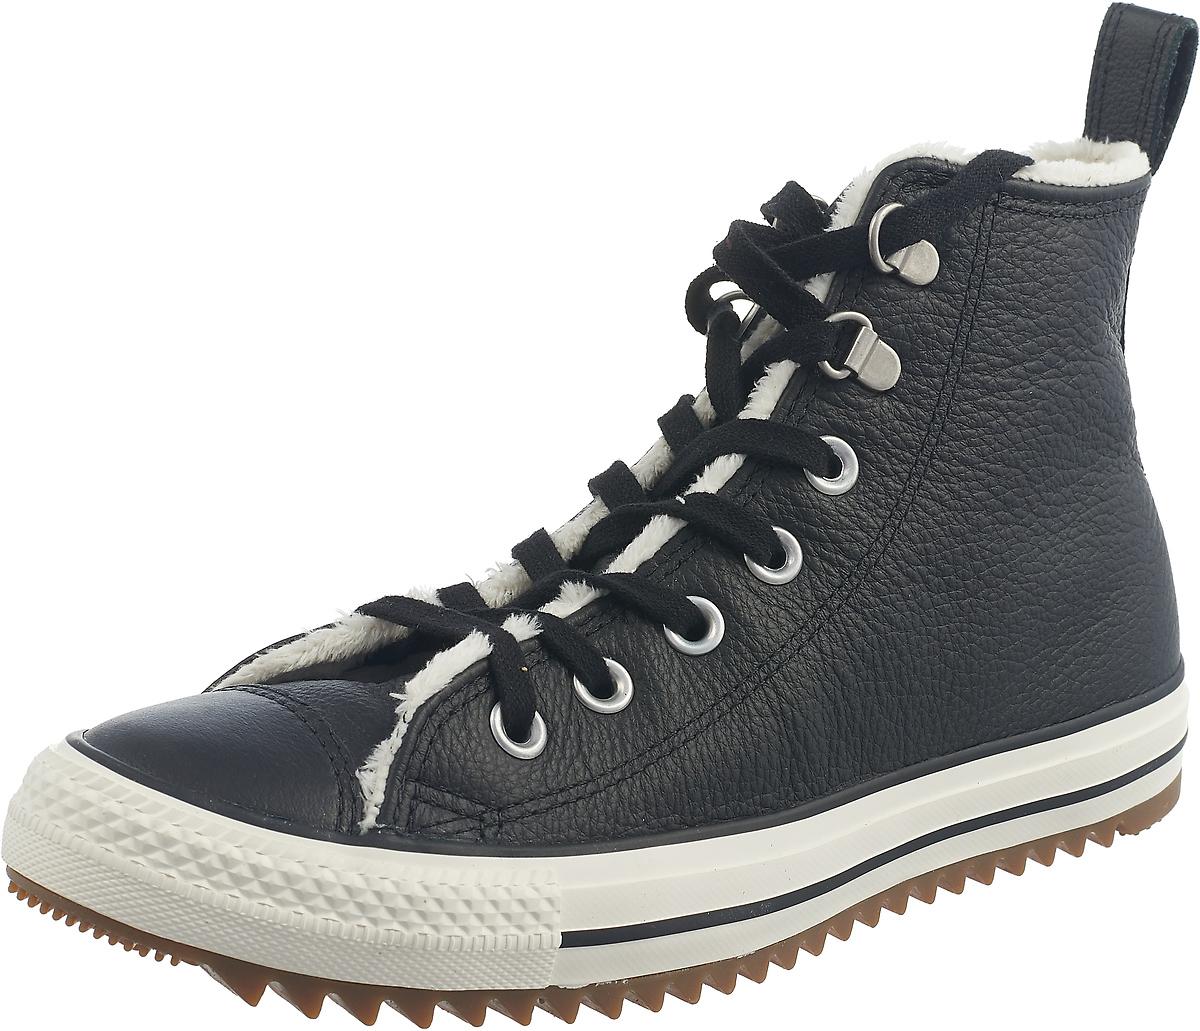 Кеды Converse Chuck Taylor All Star Hiker Boot кеды женские converse chuck taylor all star цвет белый 561684 размер 6 36 5